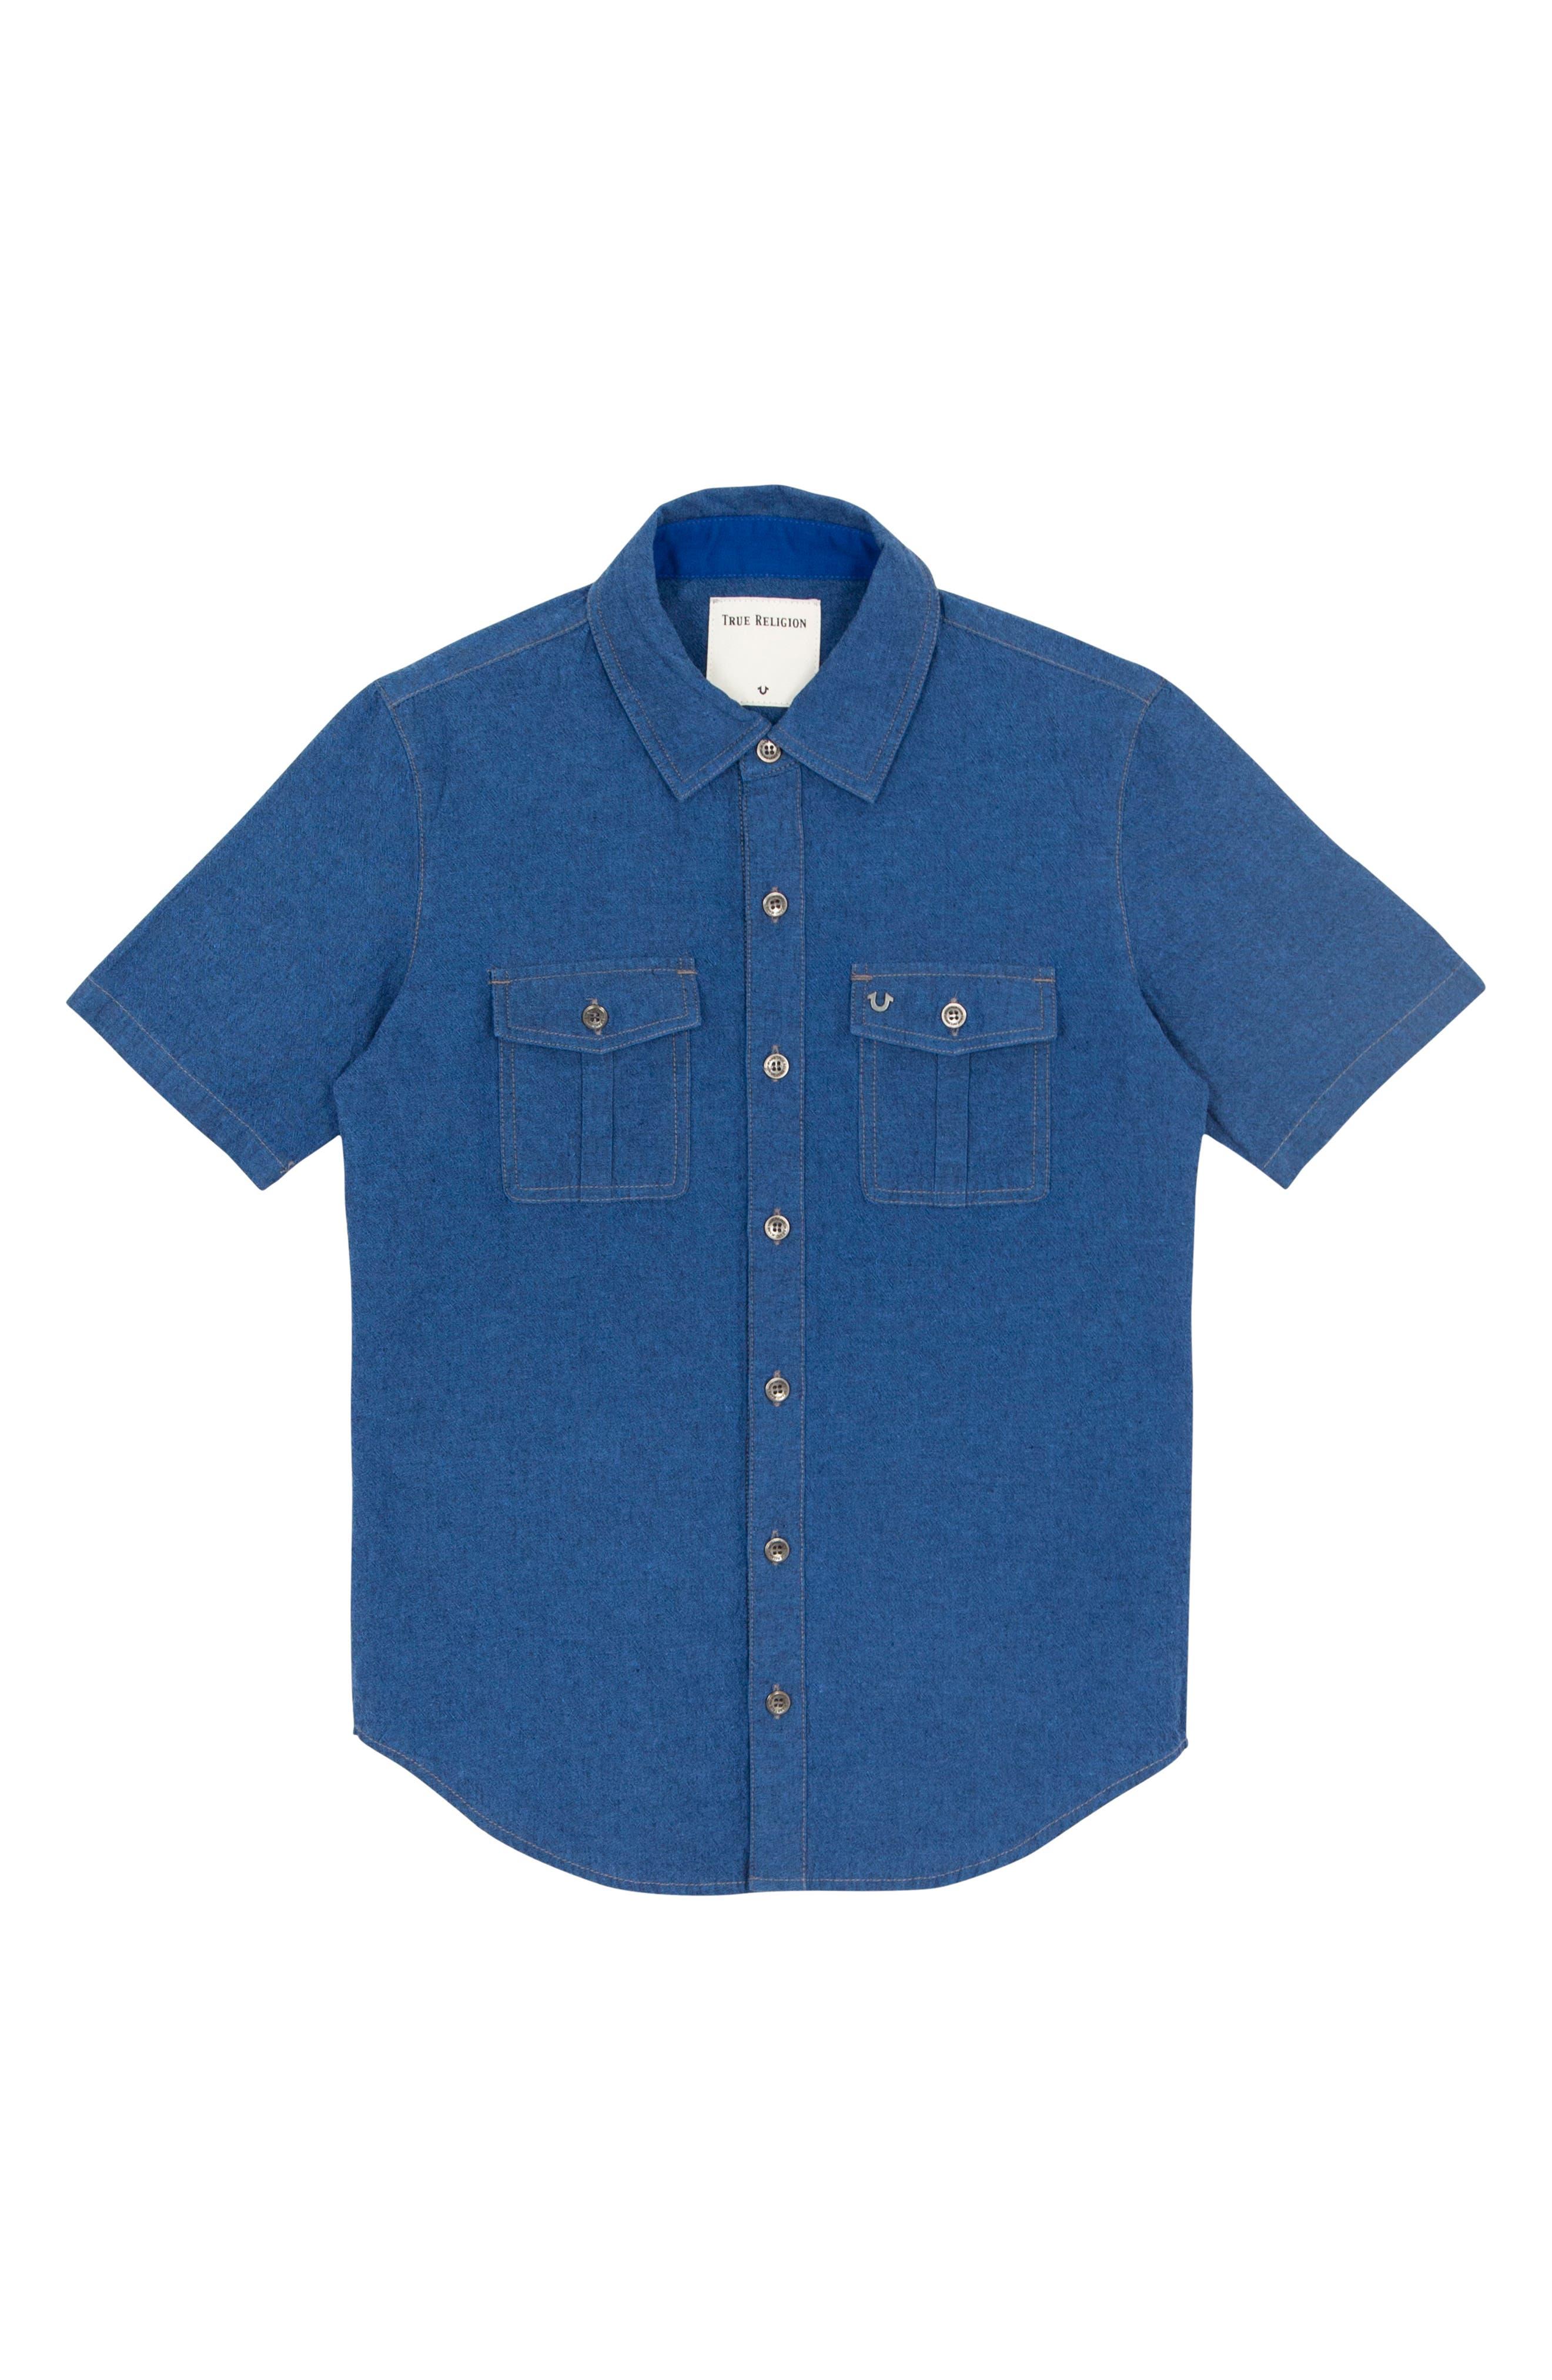 Woven Shirt,                             Main thumbnail 1, color,                             ROYAL BLUE